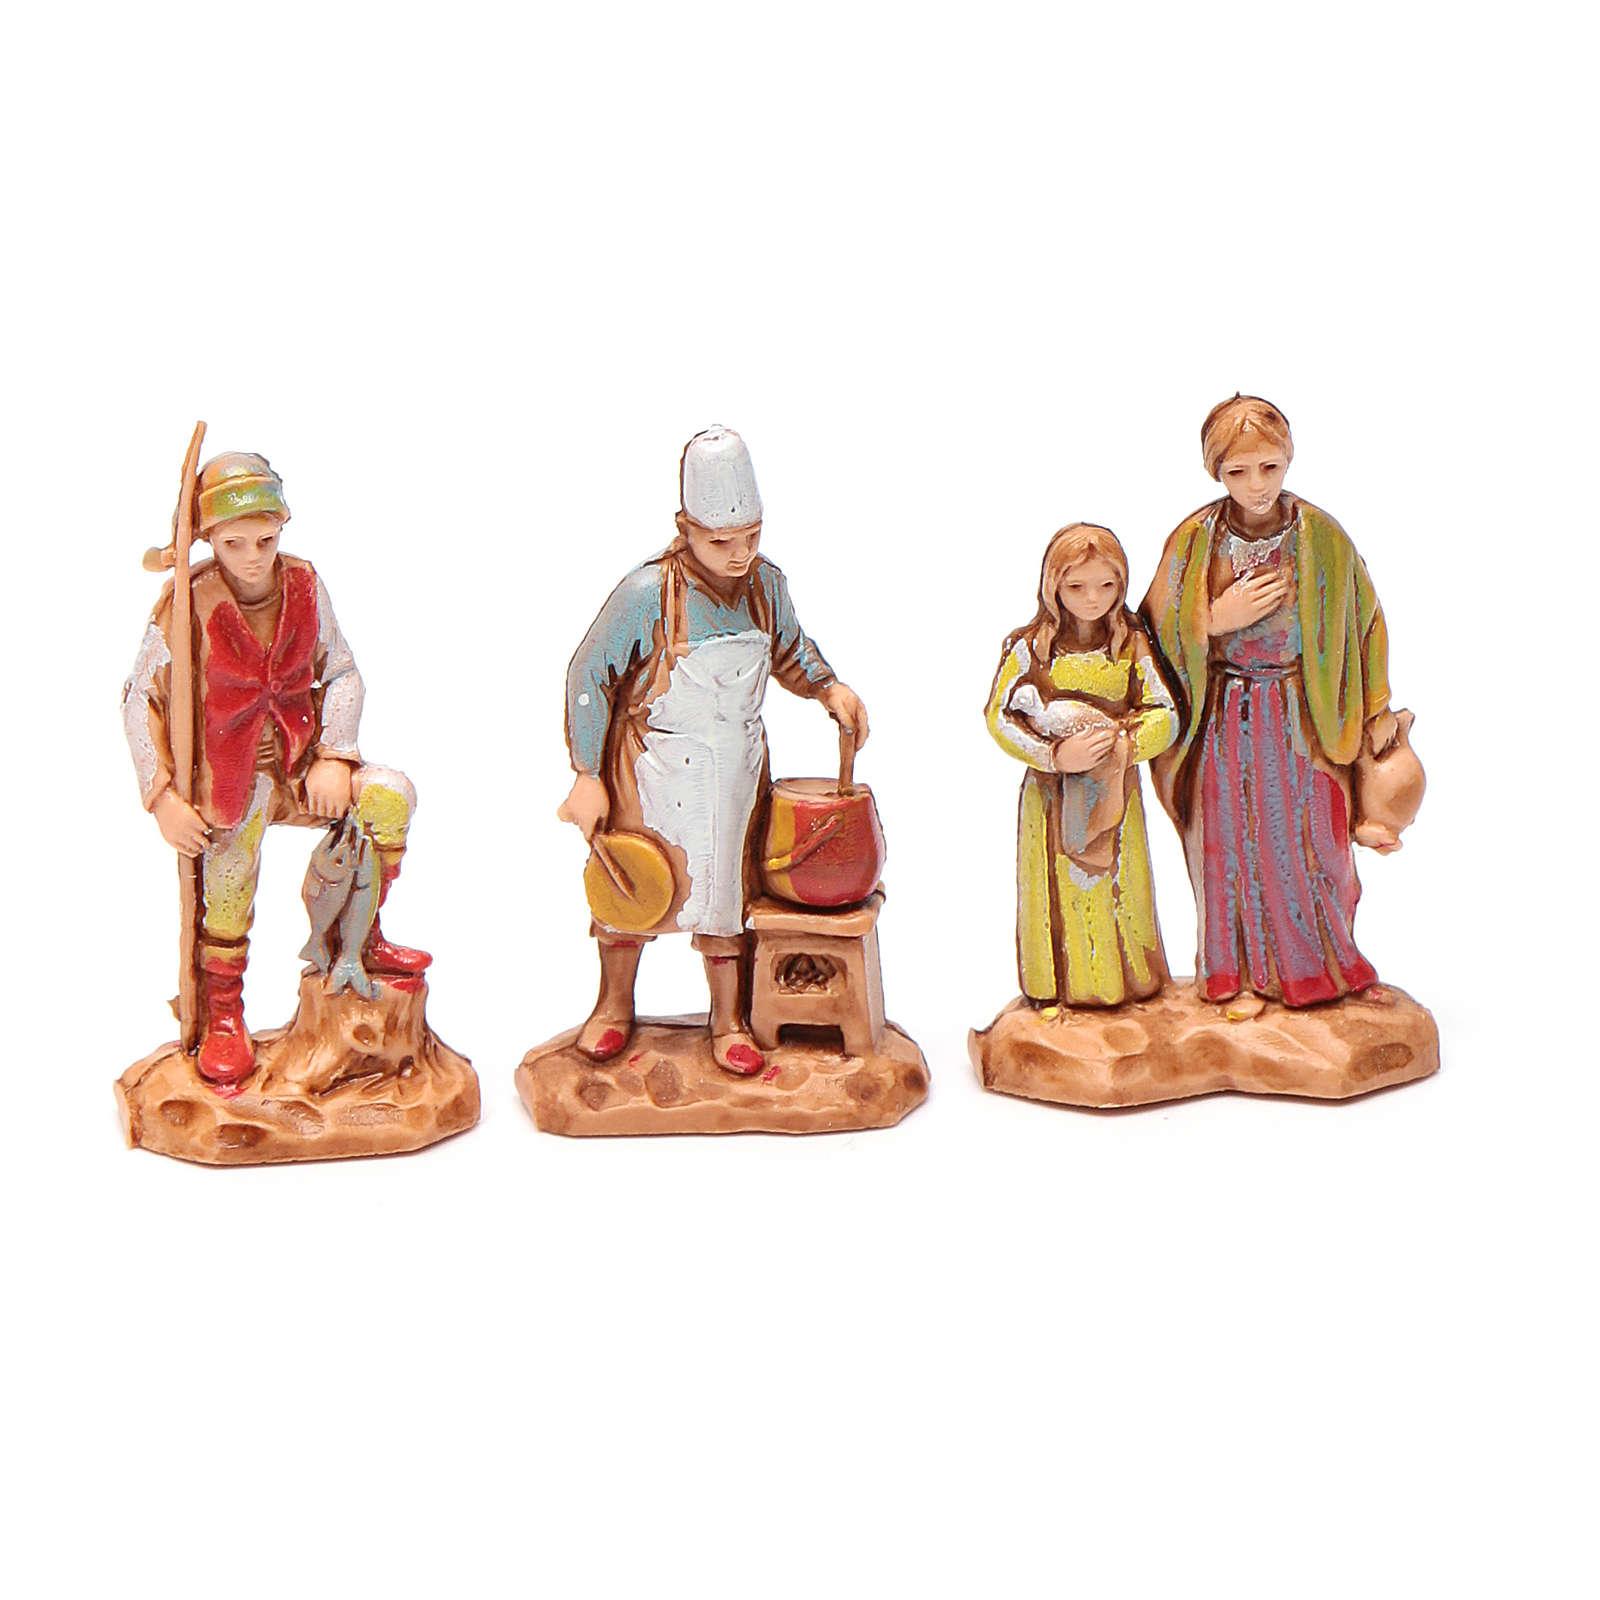 Nativity Scene characters figurines by Moranduzzo 3.5cm, 6 pieces 4